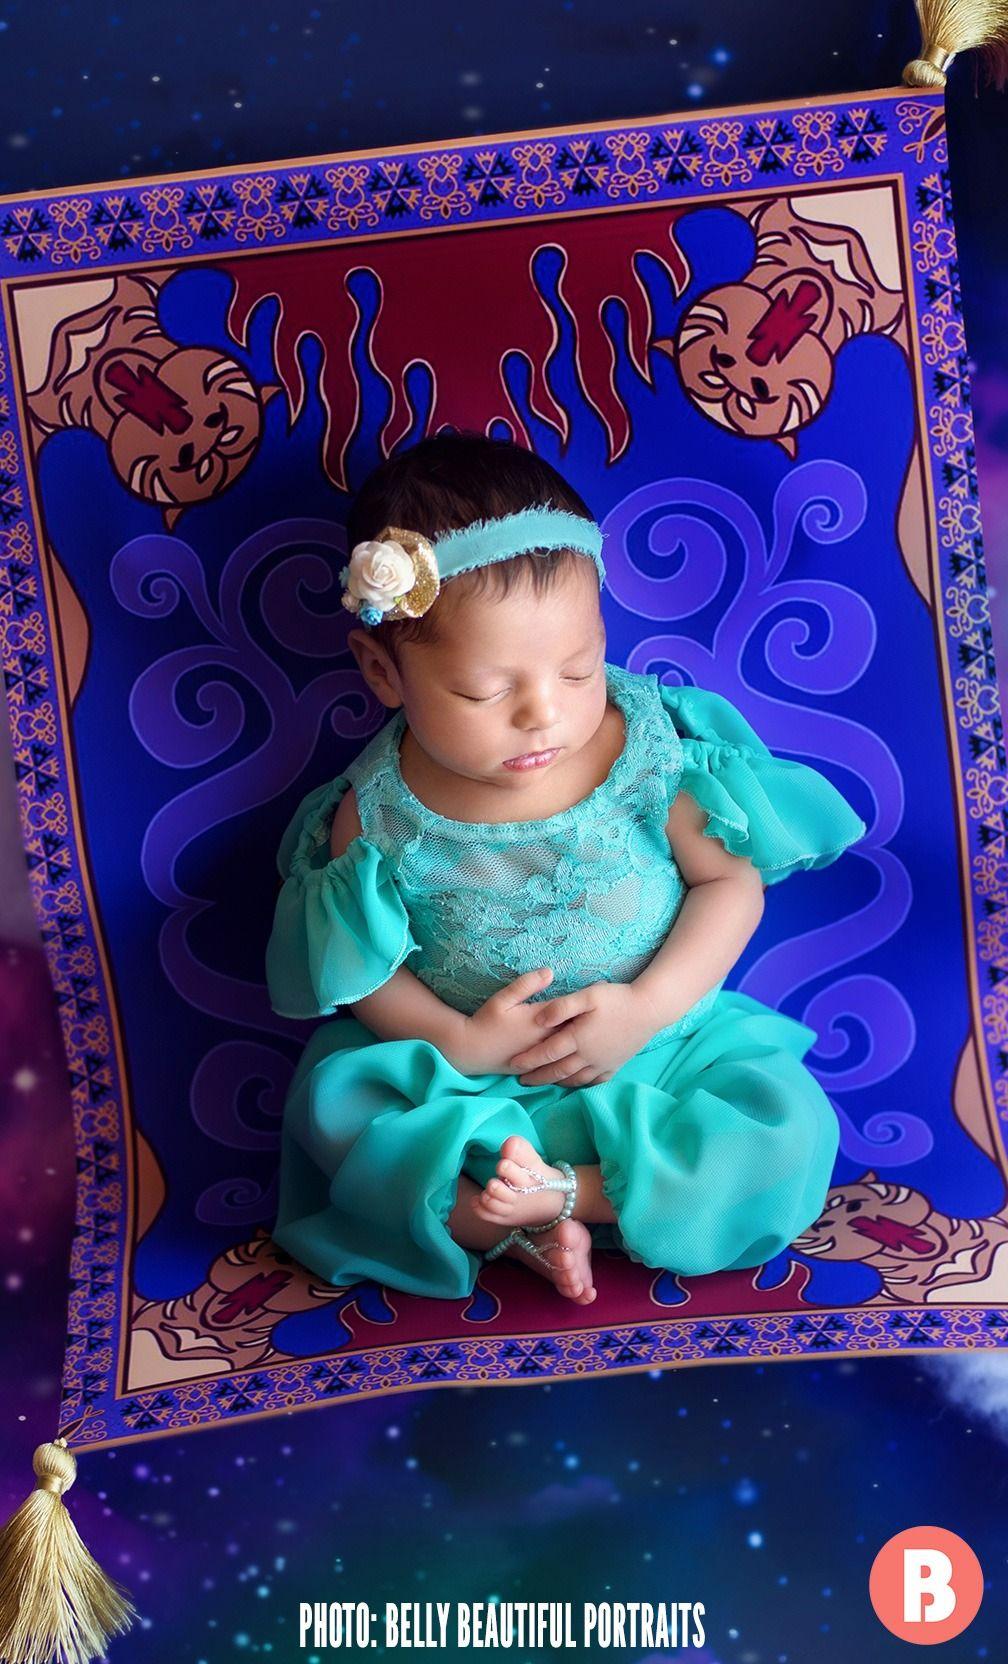 92ee836ee8270 Photographer Transforms Newborns Into Disney Princesses—And The ...